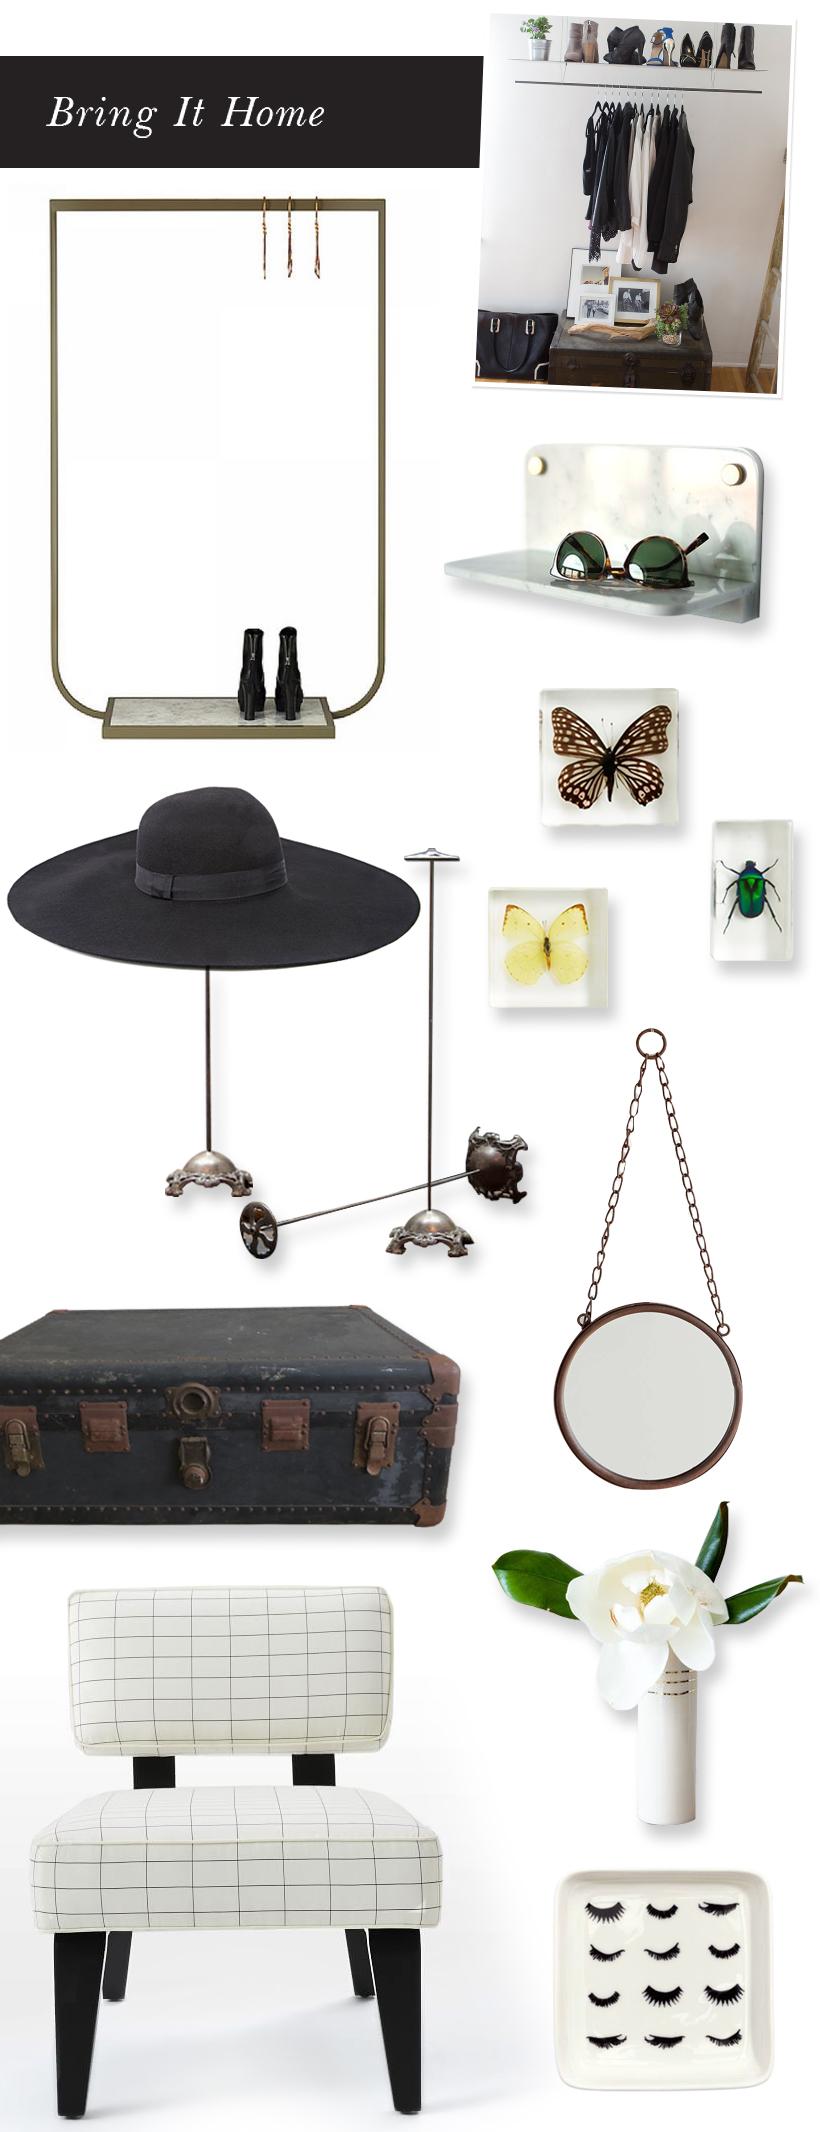 bring-it-home-capsule-wardrobe-rue-mag